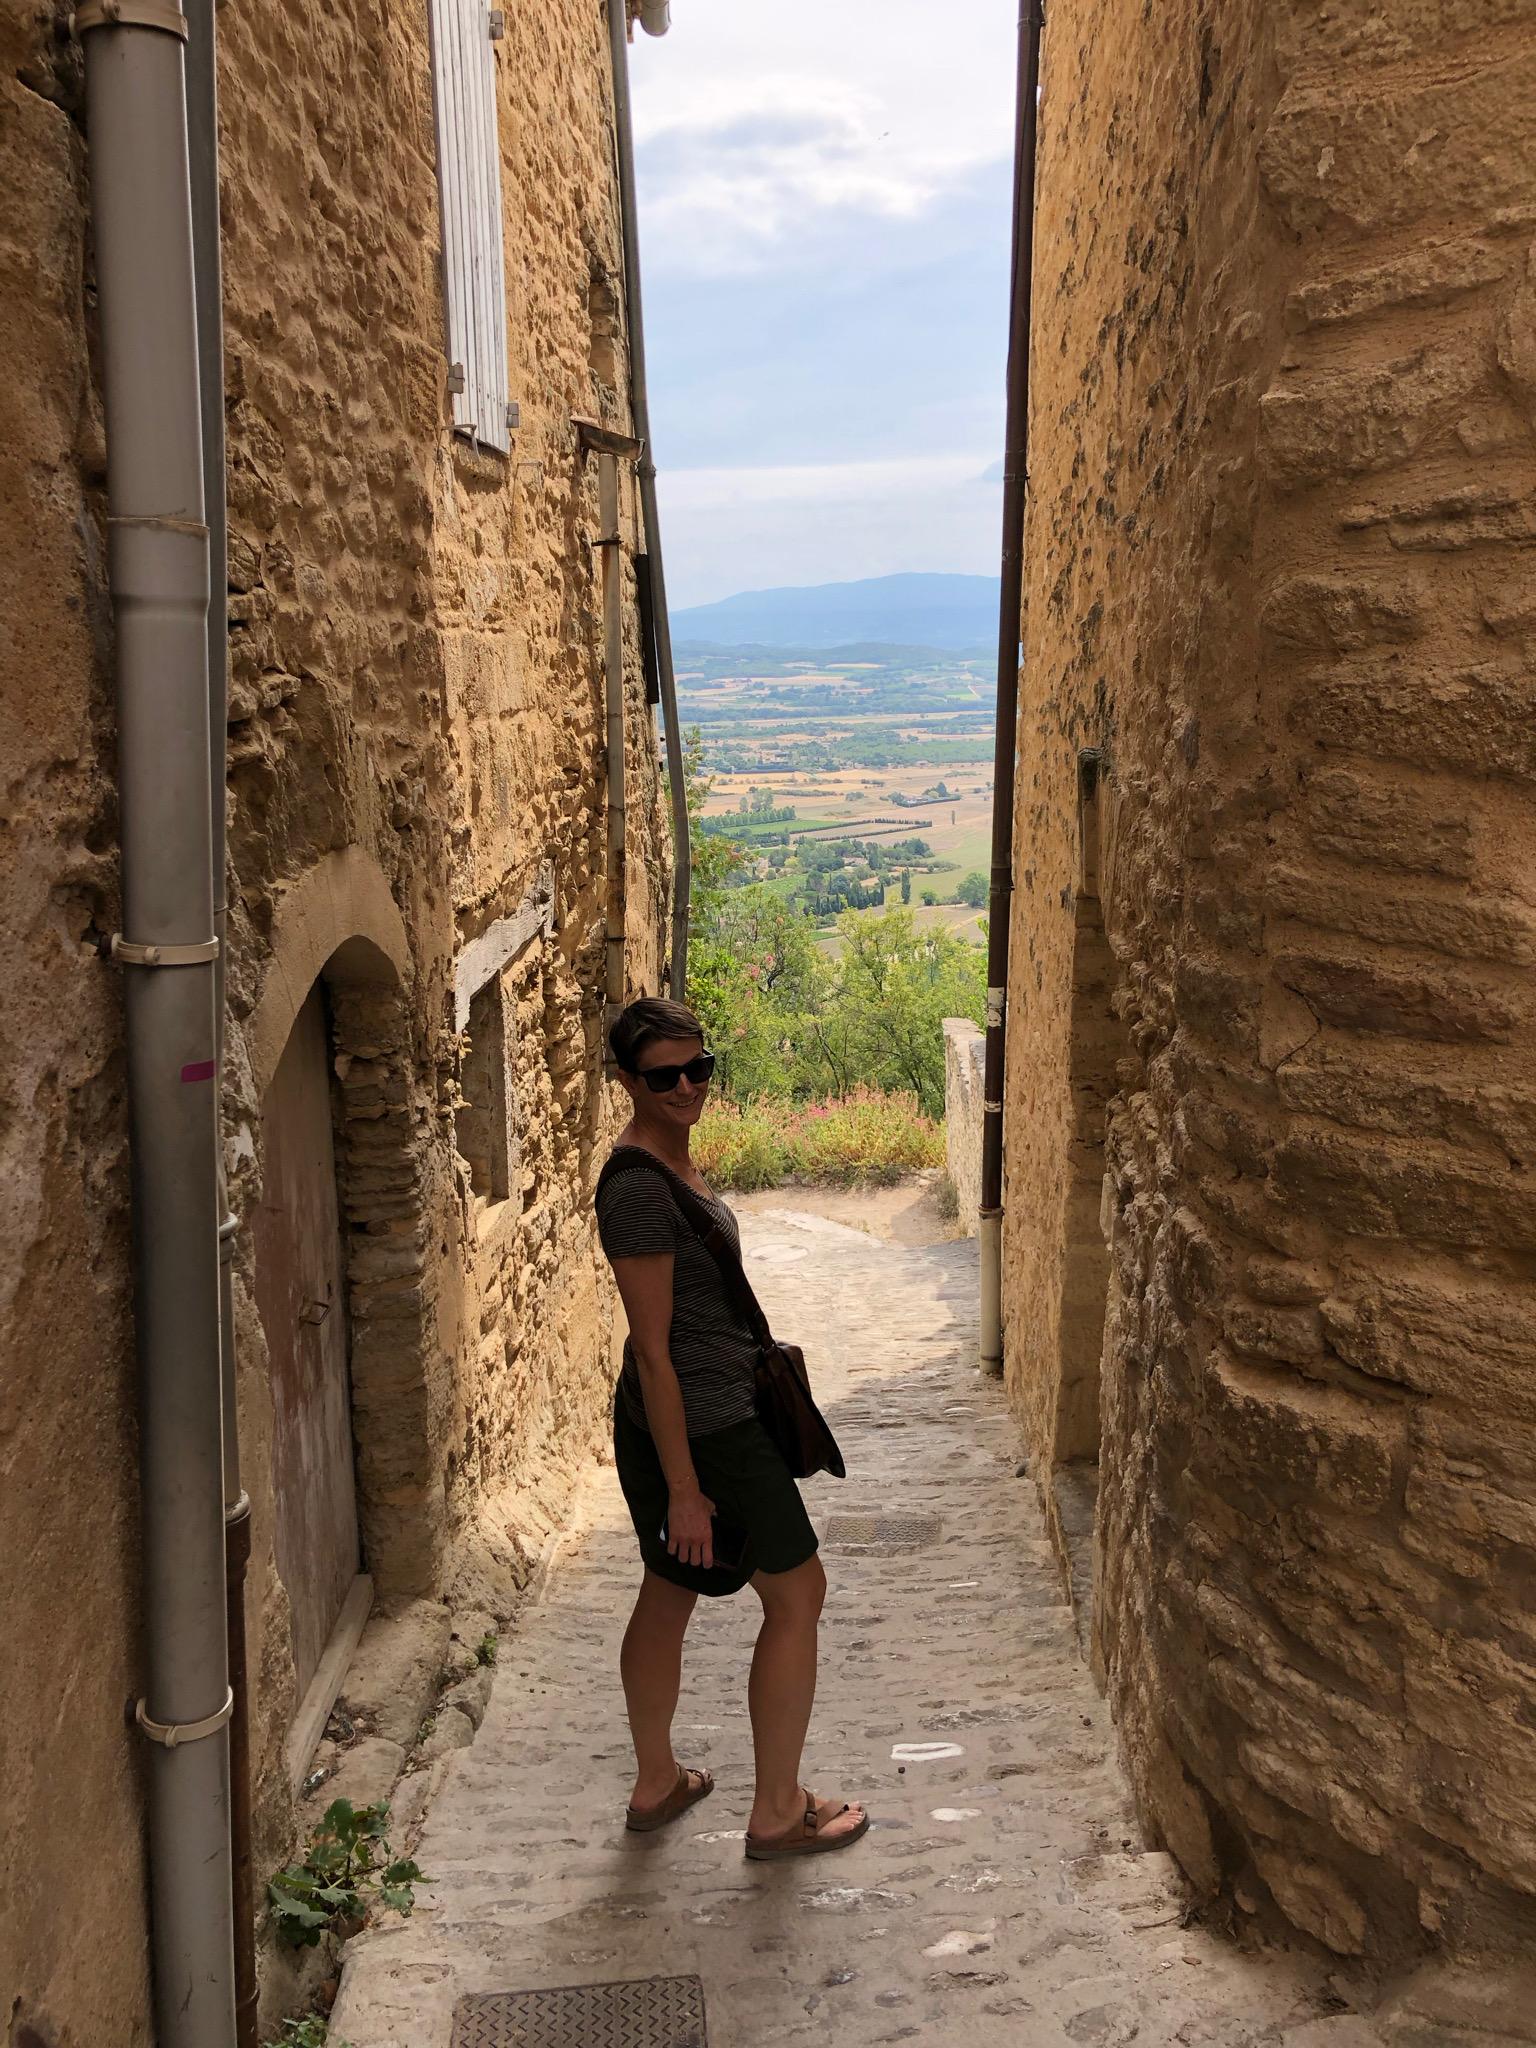 Me in Gordes, France. August 22, 2019.